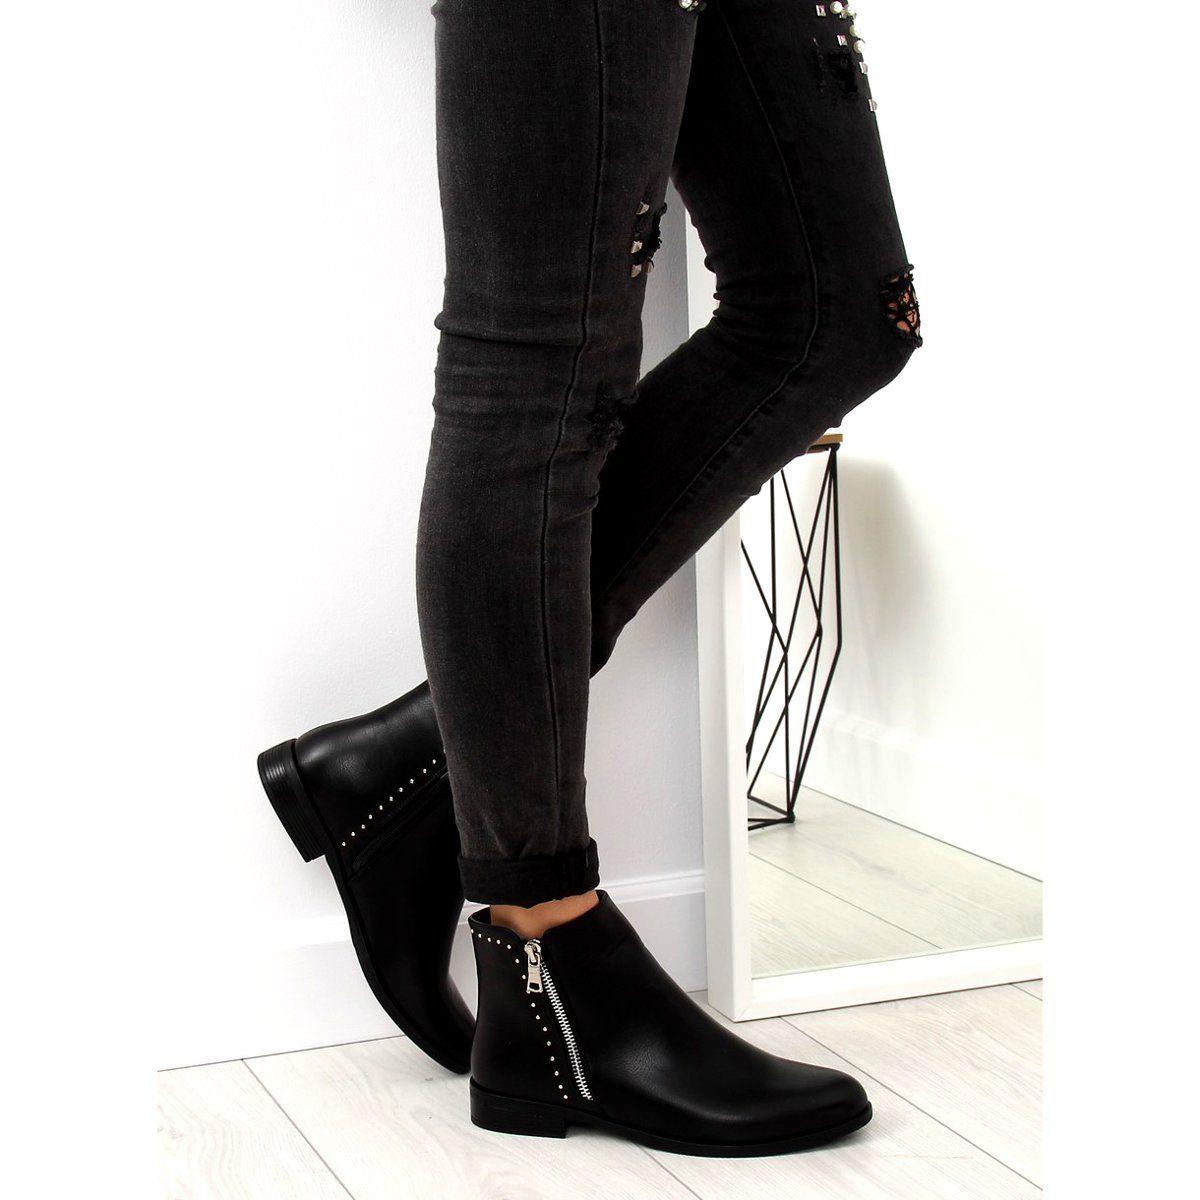 Botki Sztyblety Damskie Czarne 0 257 Black Fashion Shoes Ankle Boot